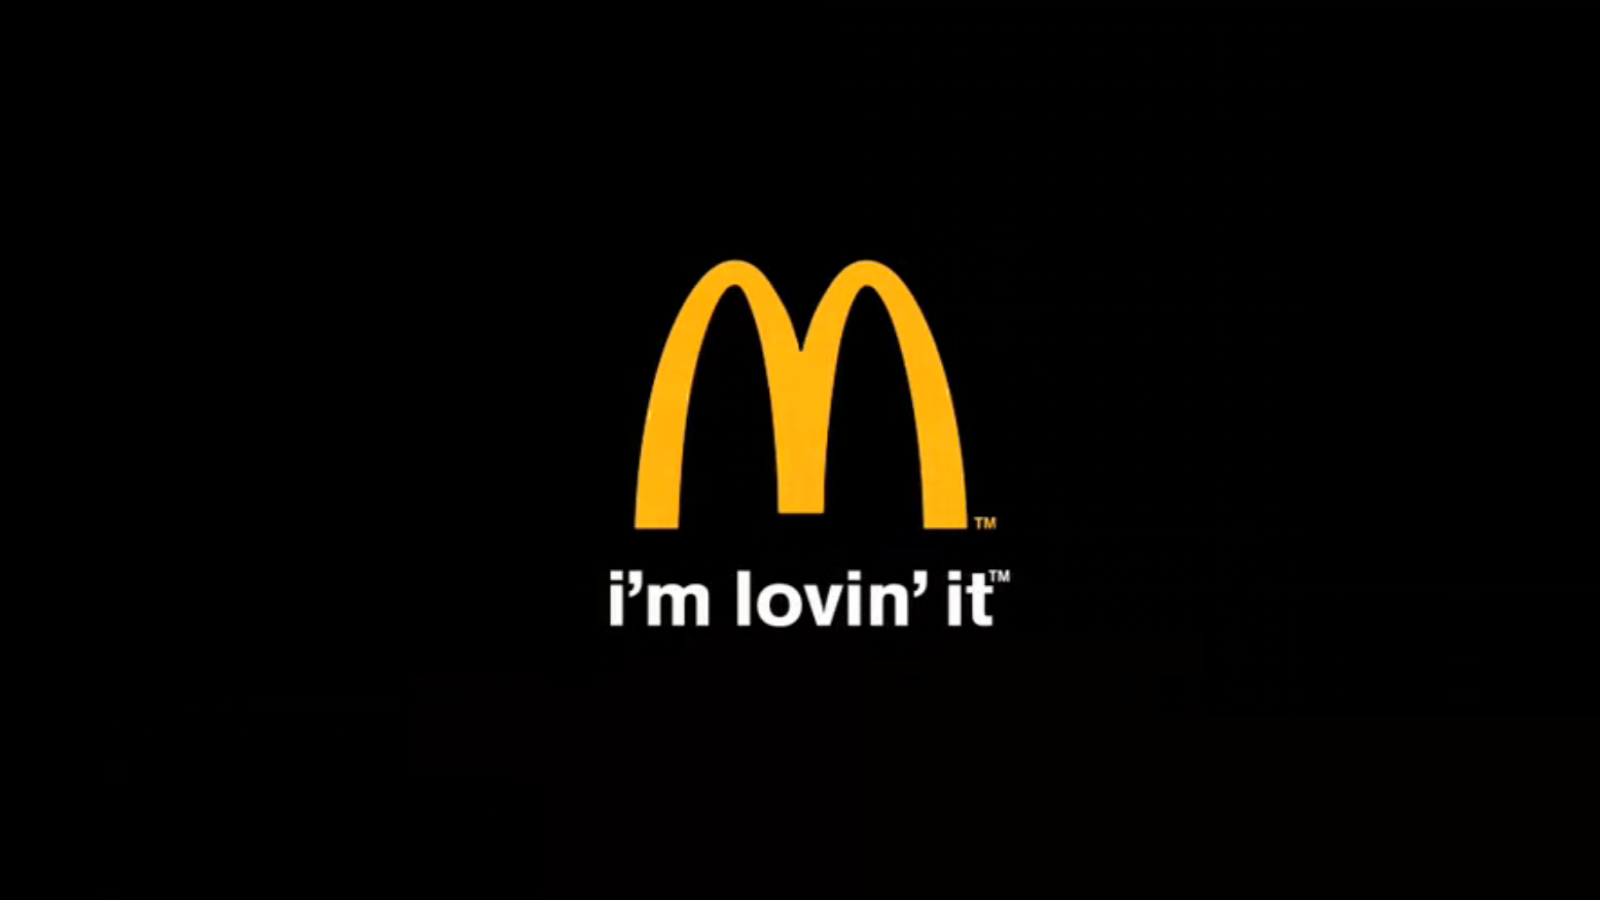 I'm lovin' it - Slogan desde 2003